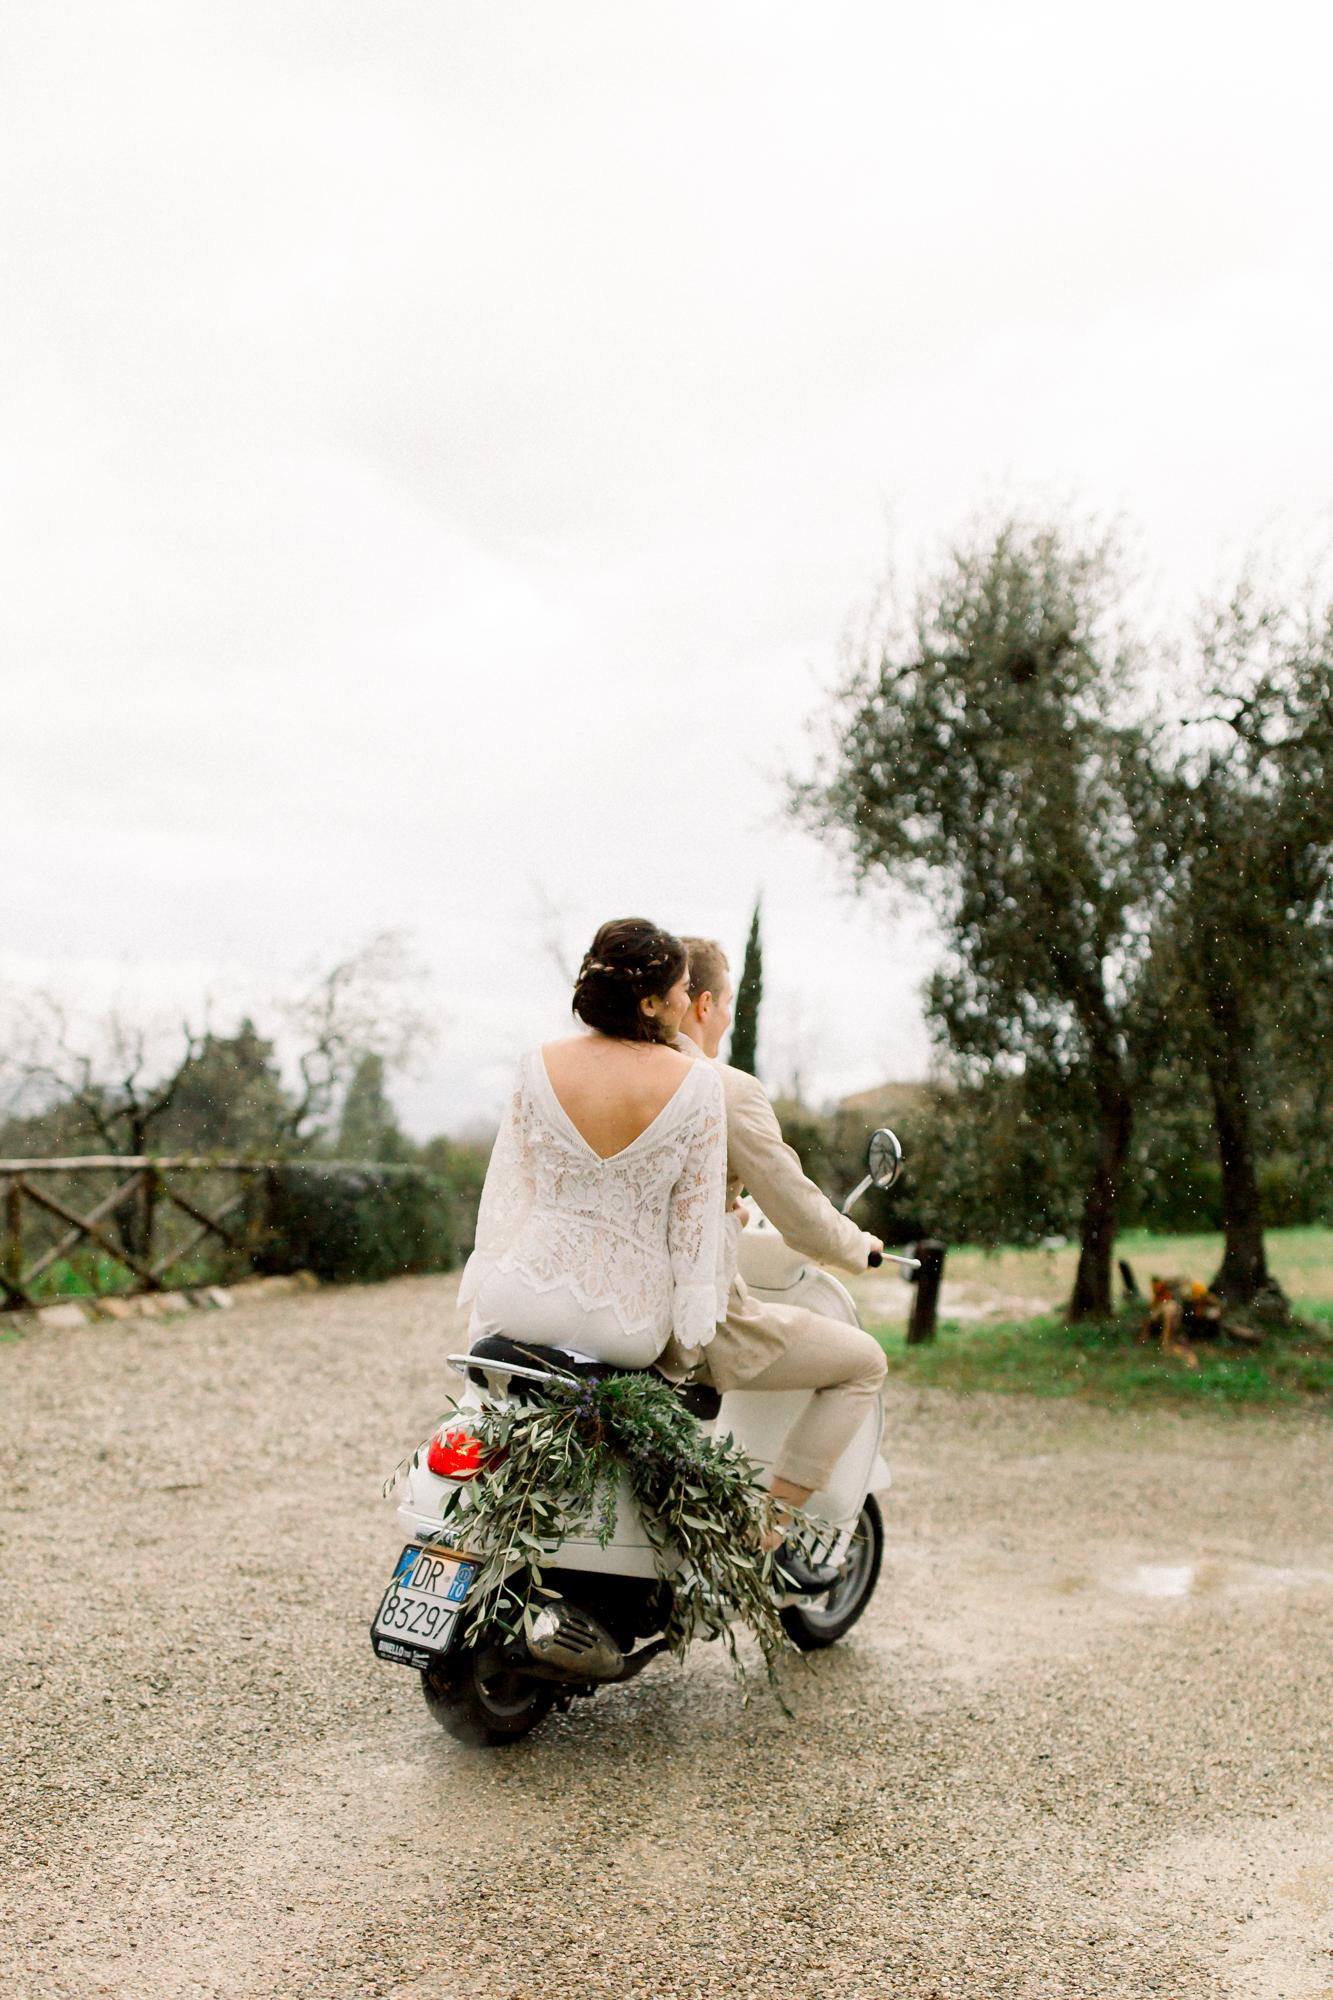 Tuscan Vespa Wedding - Britt LaShea-39.jpg